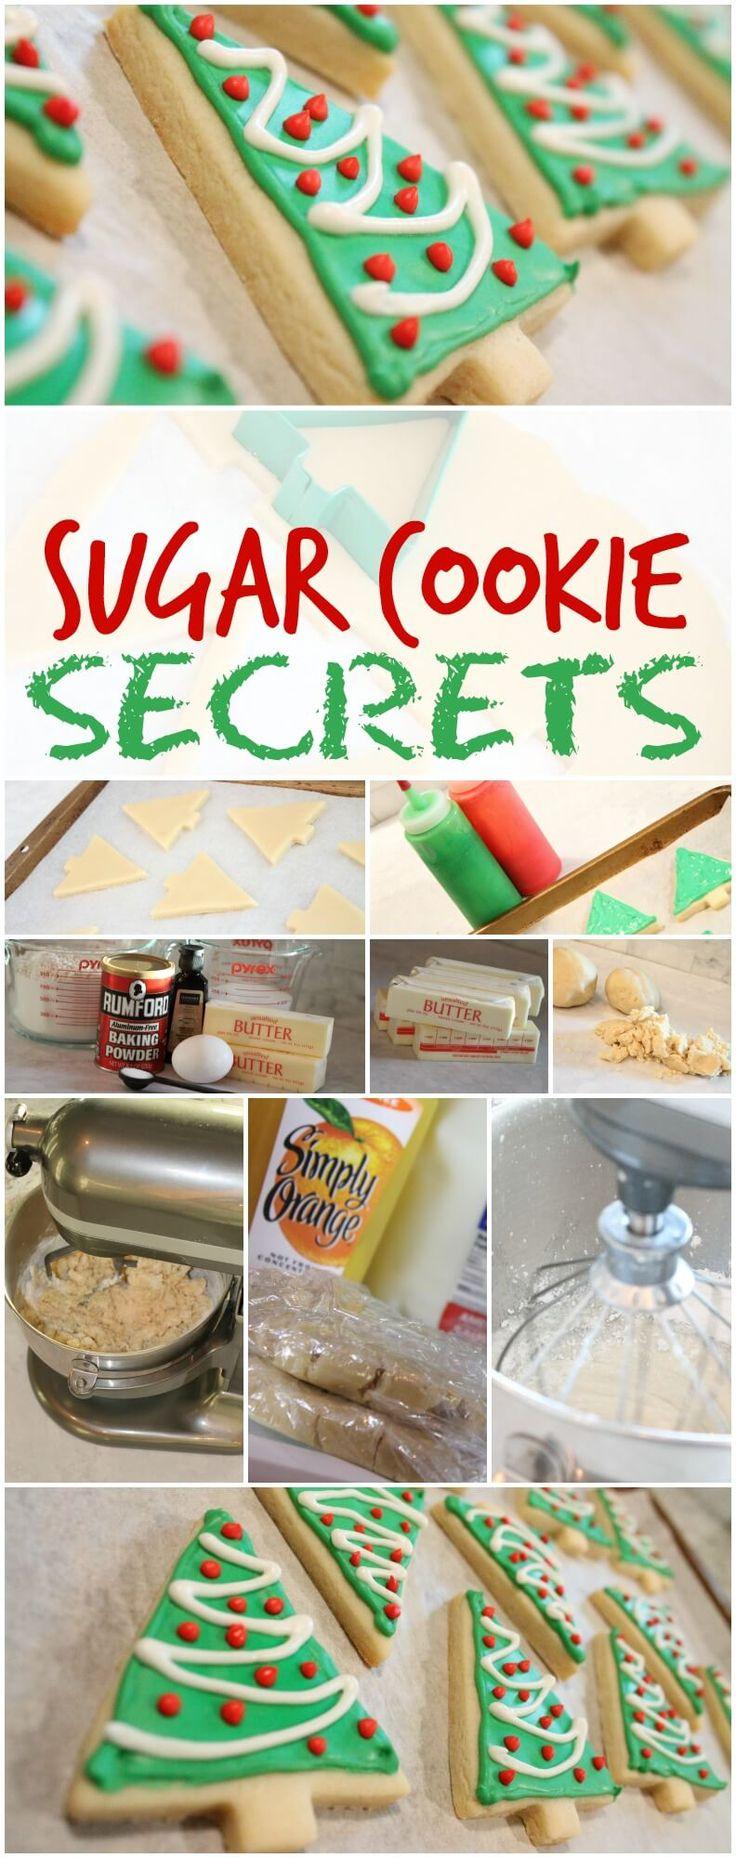 Sugar Cookie Secrets More